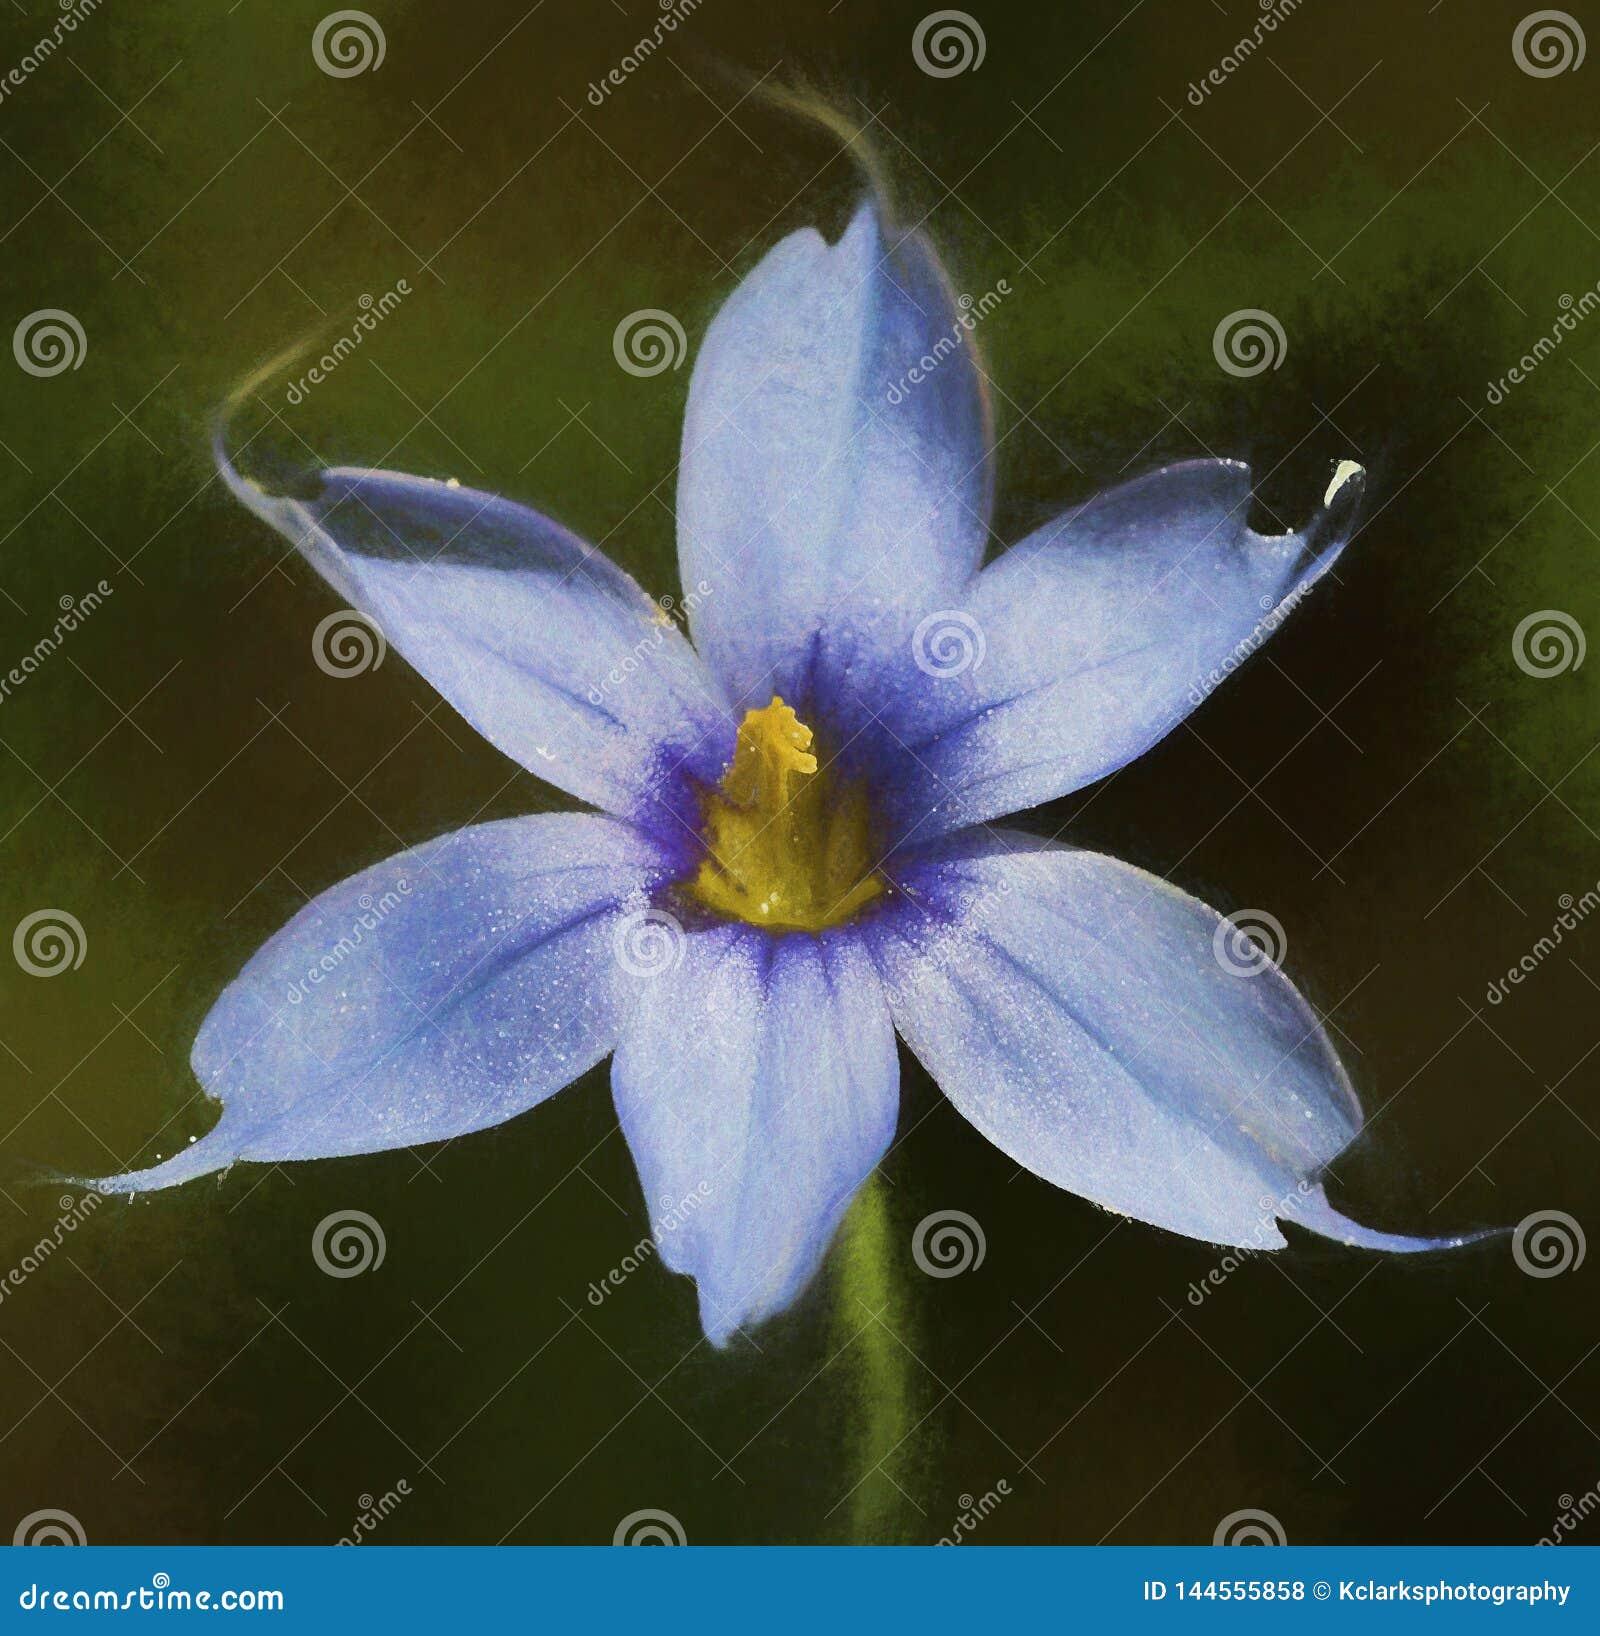 Narrowleaf blåögt gräs - Sisyrinchiumangustifolium